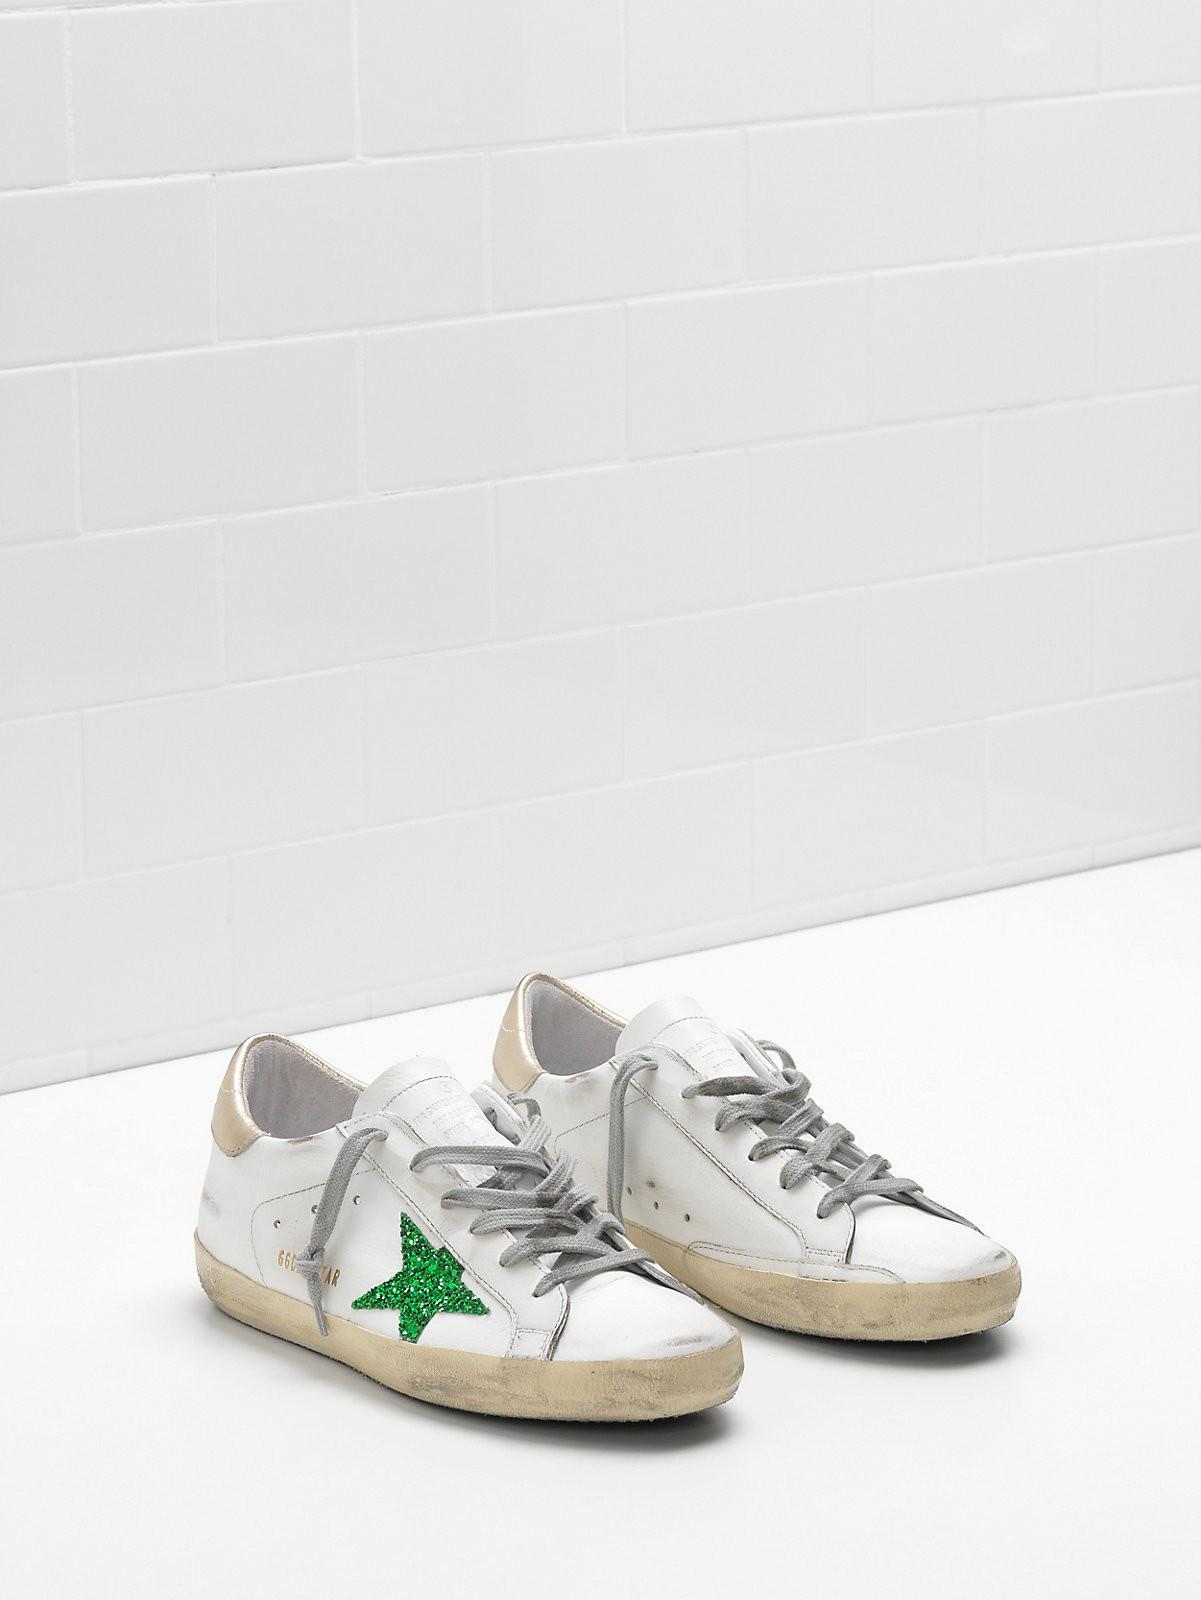 6ed70d7e09b4c 2019 Designer Shoes Golden Goose Ggdb Old Style Sneakers Genuine Leather  Villous Dermis Mens Women Luxury Superstar Trainers W014 Online with  $82.48/Piece ...